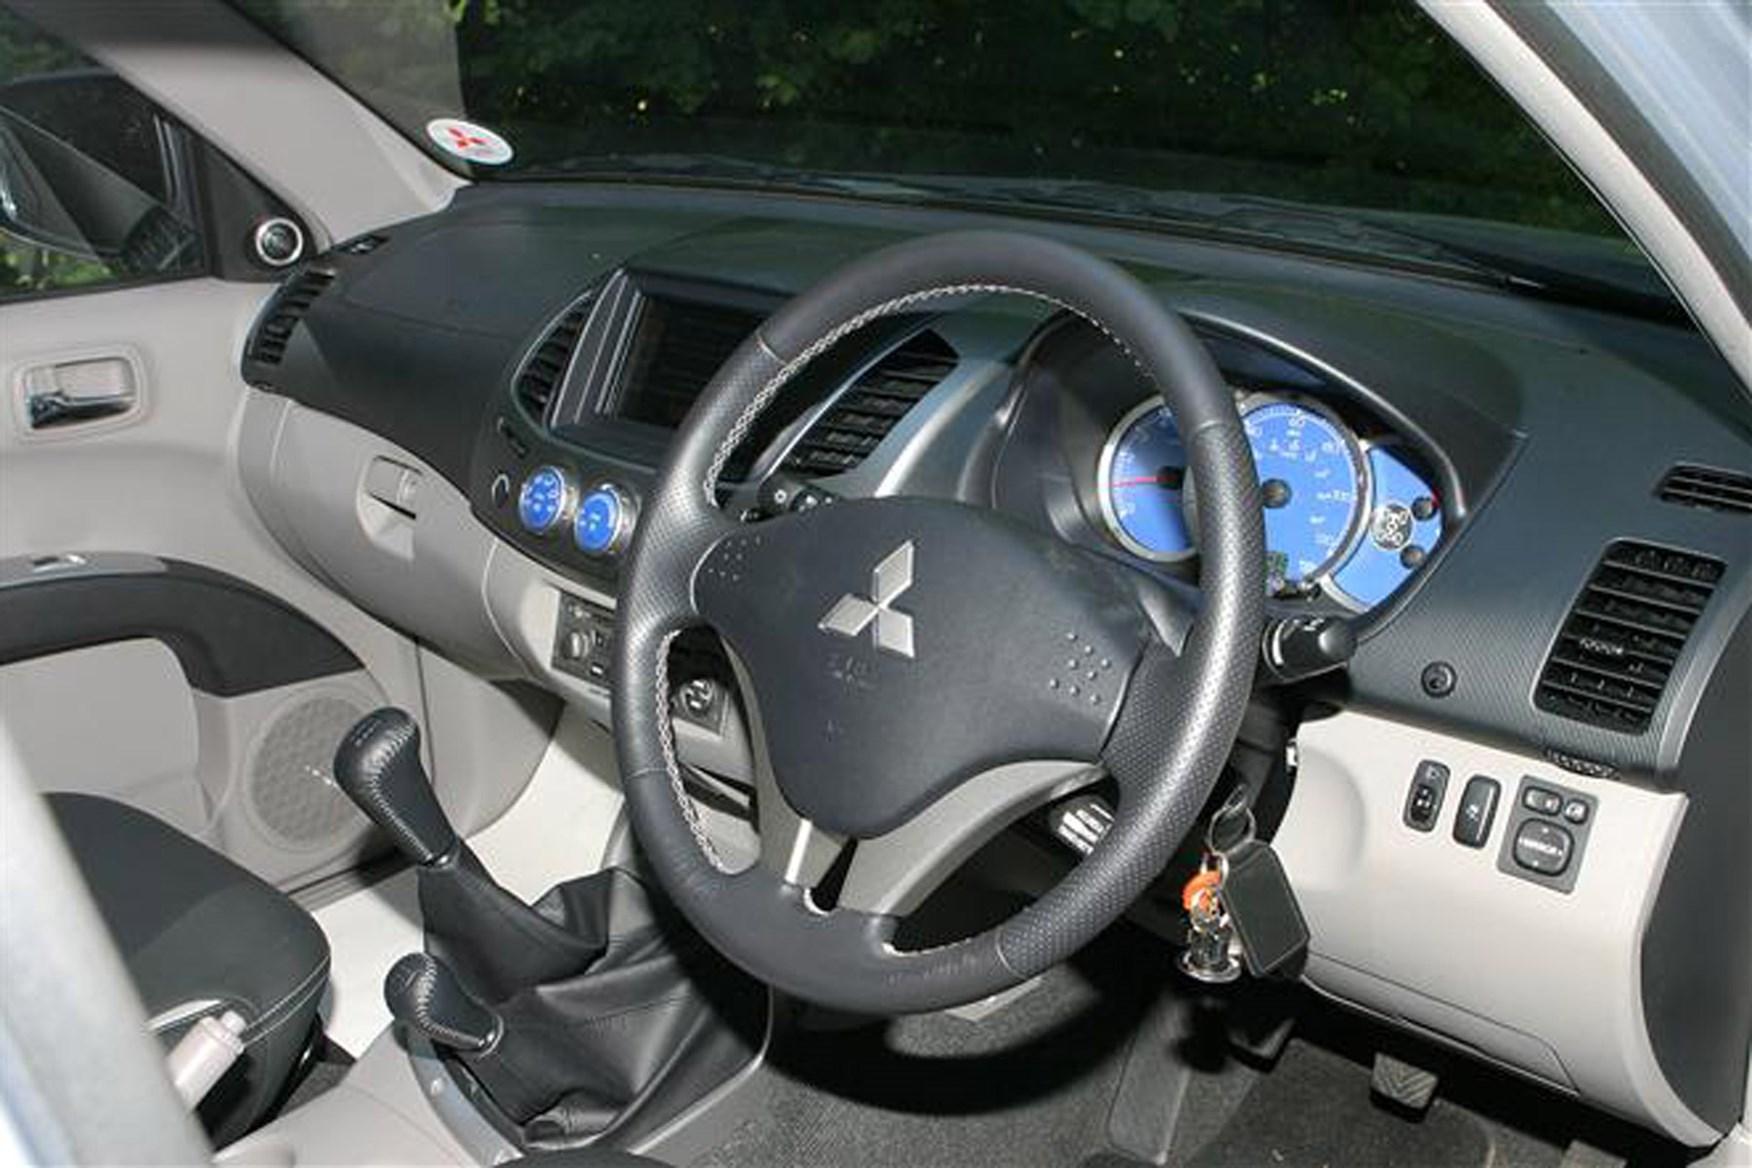 Mitsubishi L200 2006-2015 review on Parkers Vans - interior